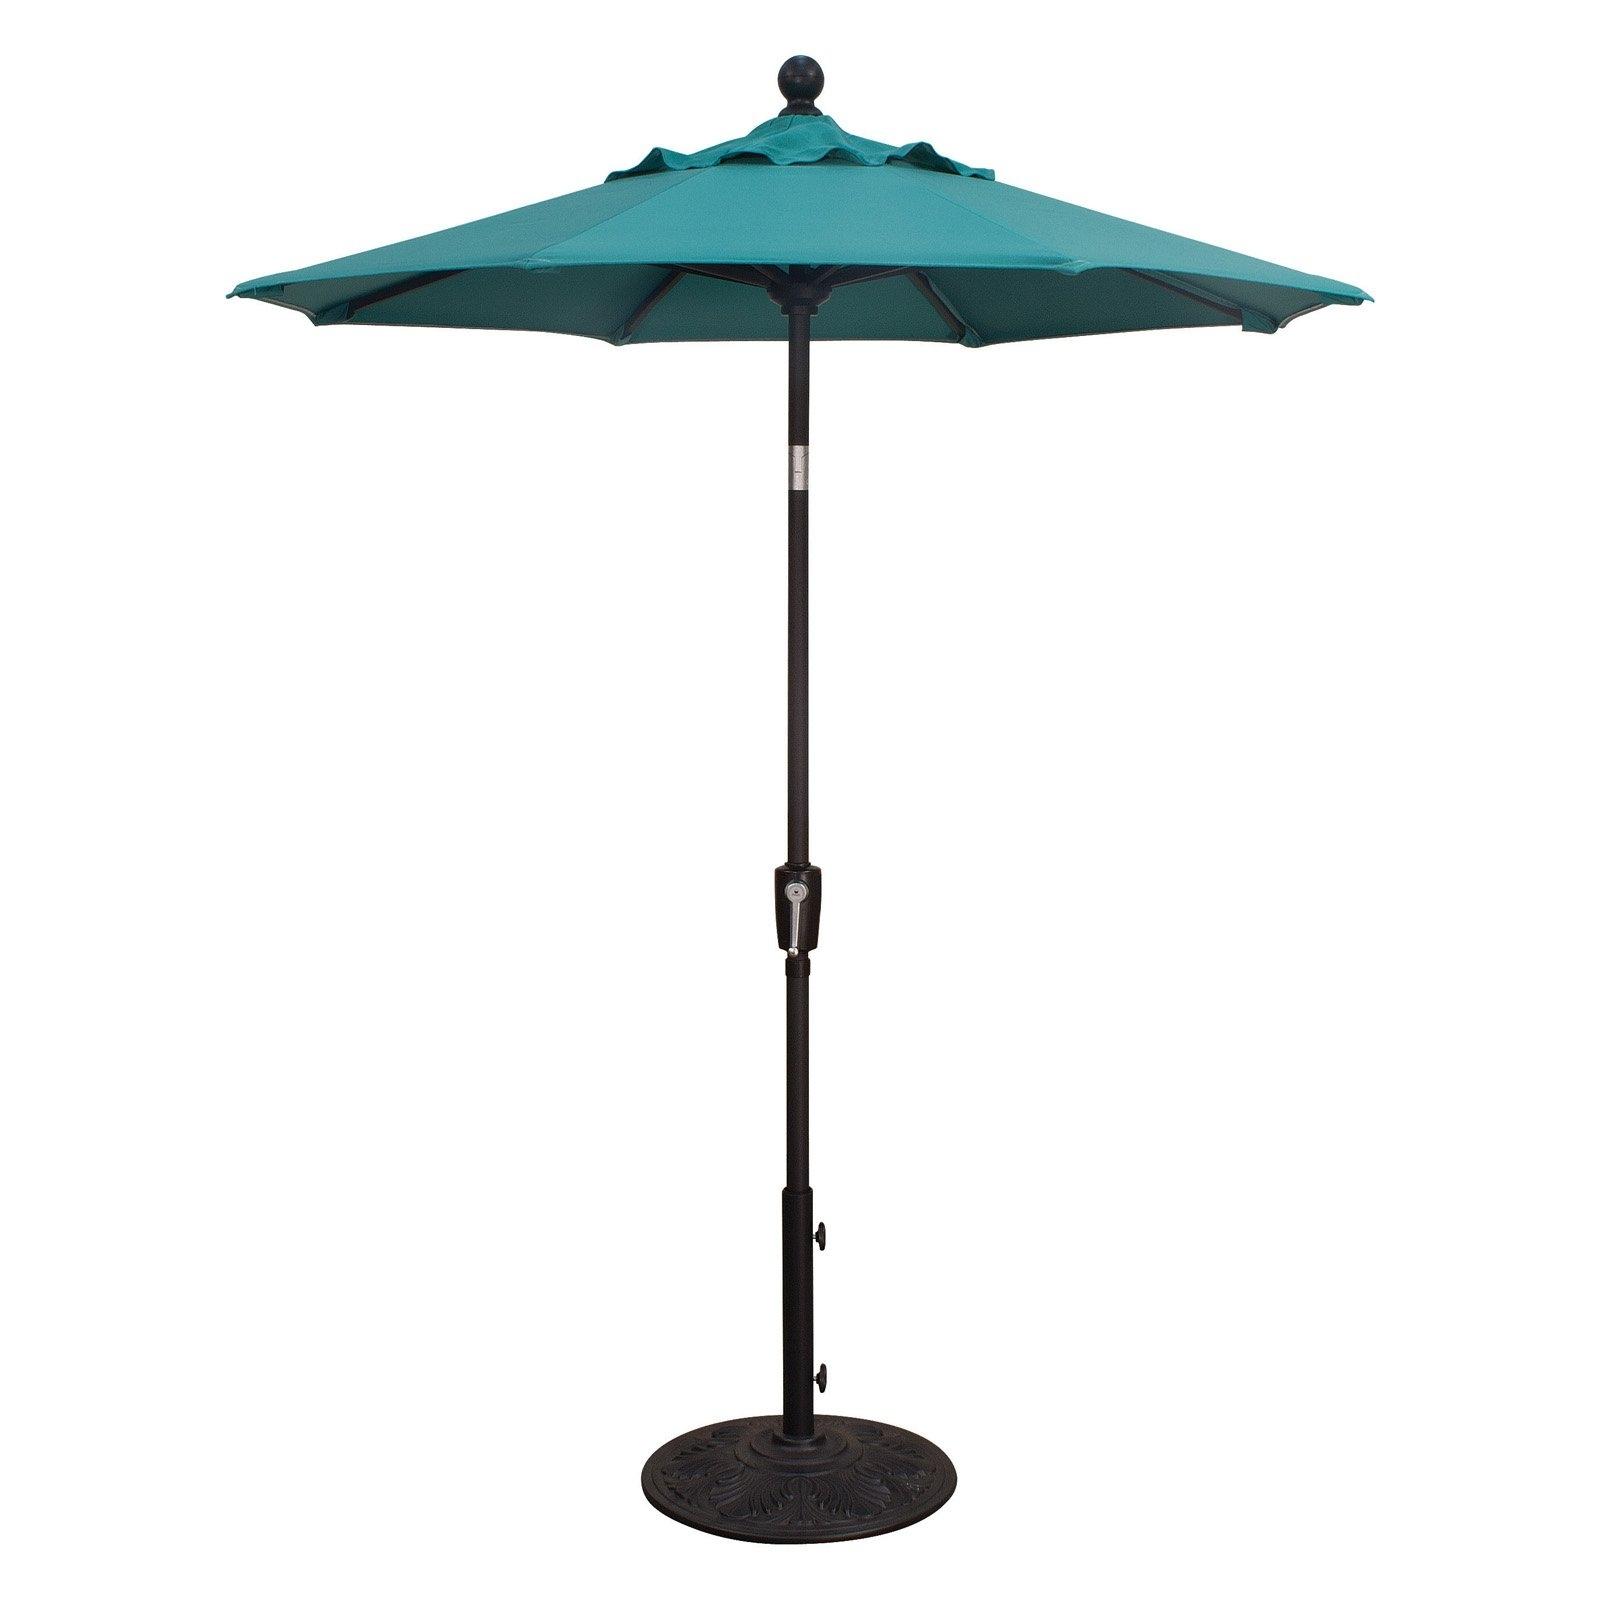 Latest 6 Foot Patio Umbrellas • Patio Ideas Within Yescom Patio Umbrellas (Gallery 20 of 20)